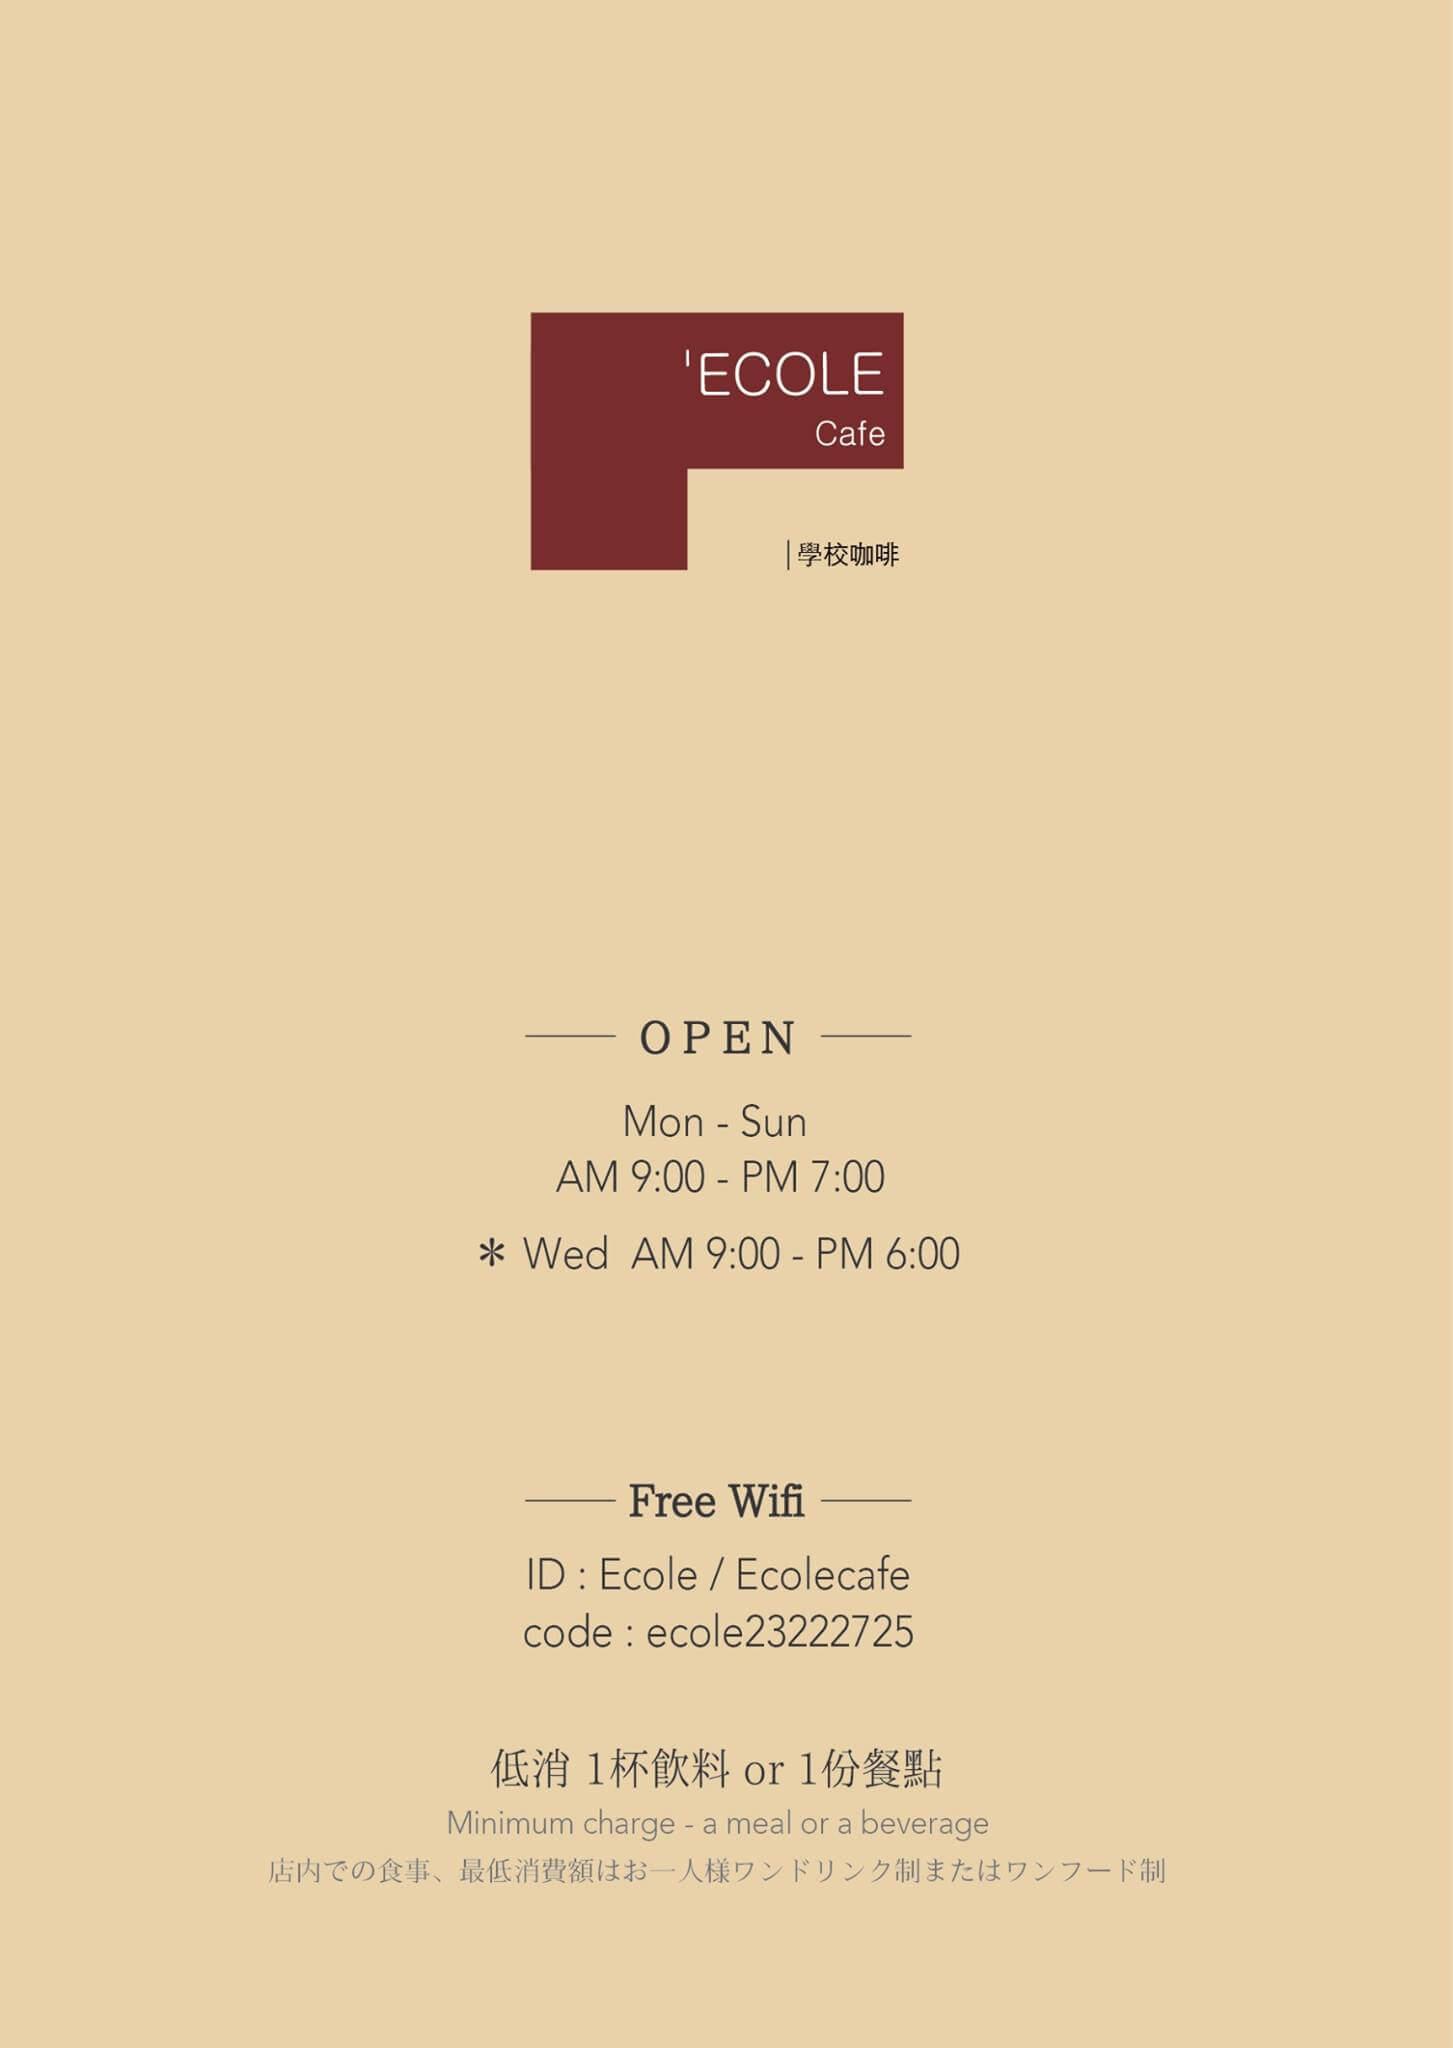 學校咖啡館 Ecole Cafe